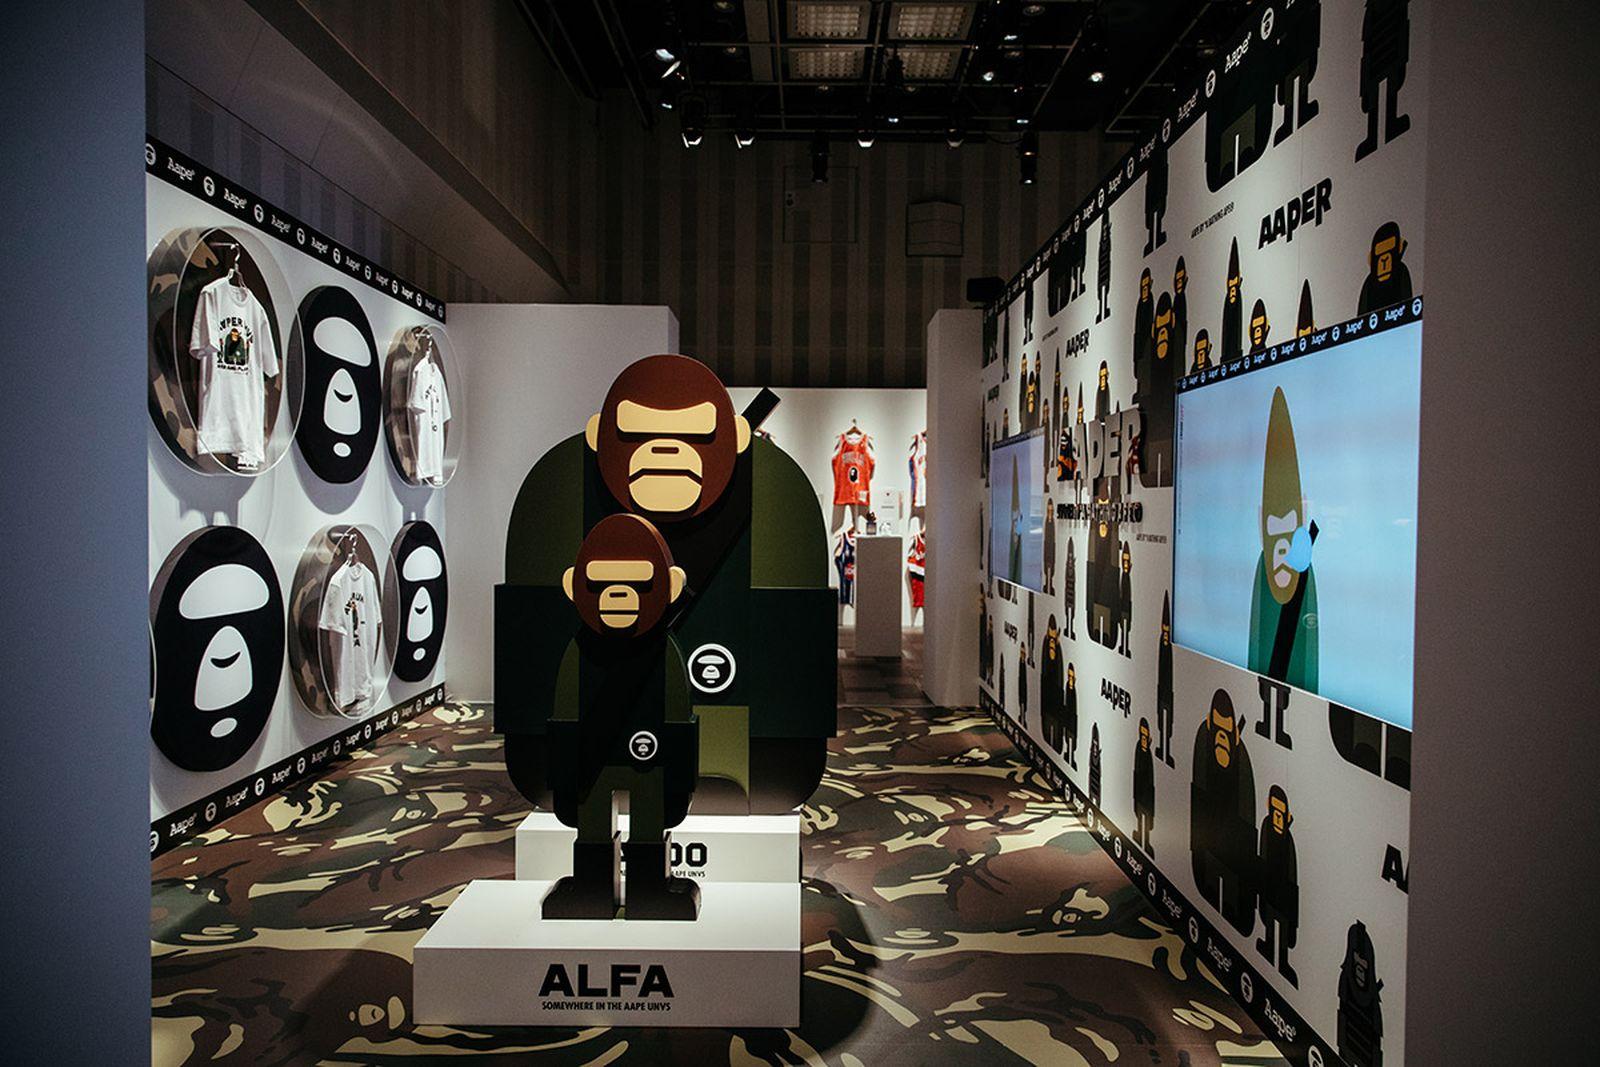 bape 25th anniversary exhibit A Bathing Ape